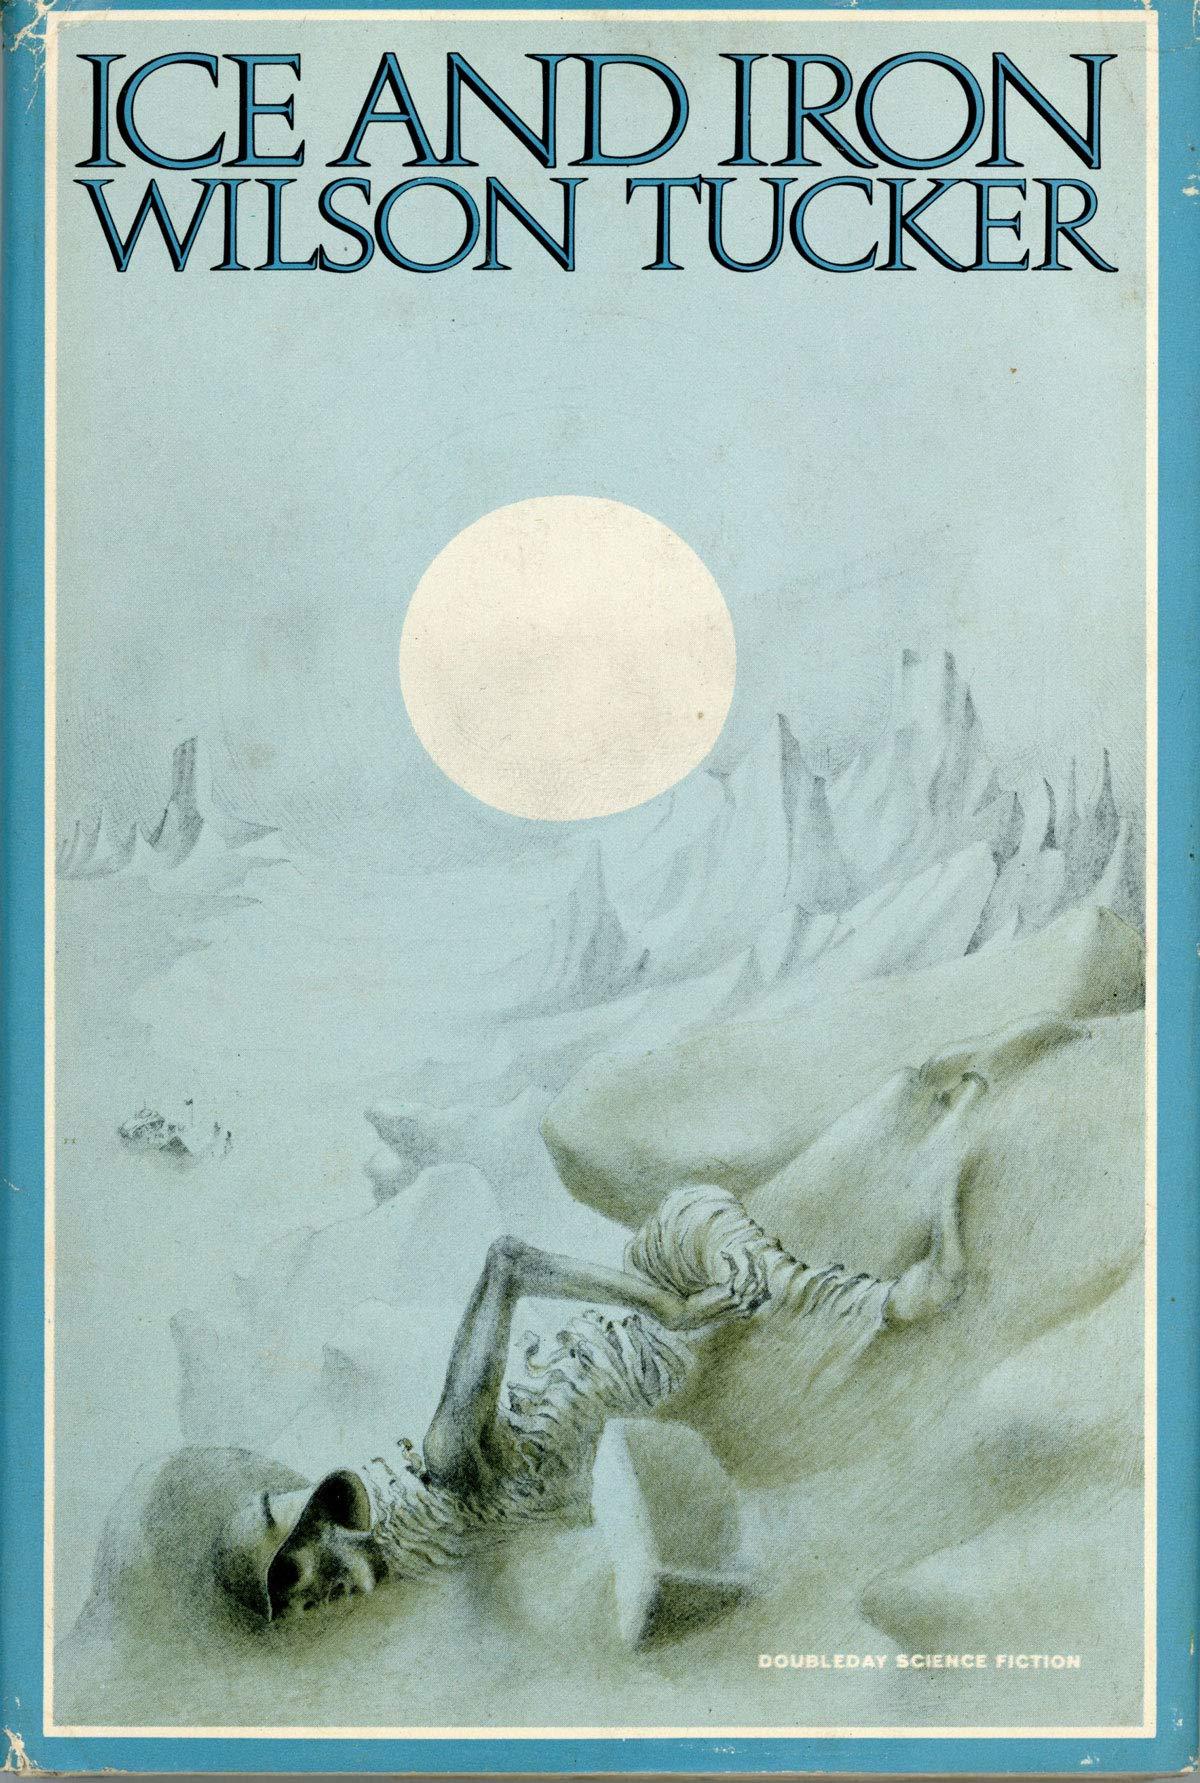 Ice and Iron: Amazon.co.uk: Wilson Tucker: 9780385004855: Books